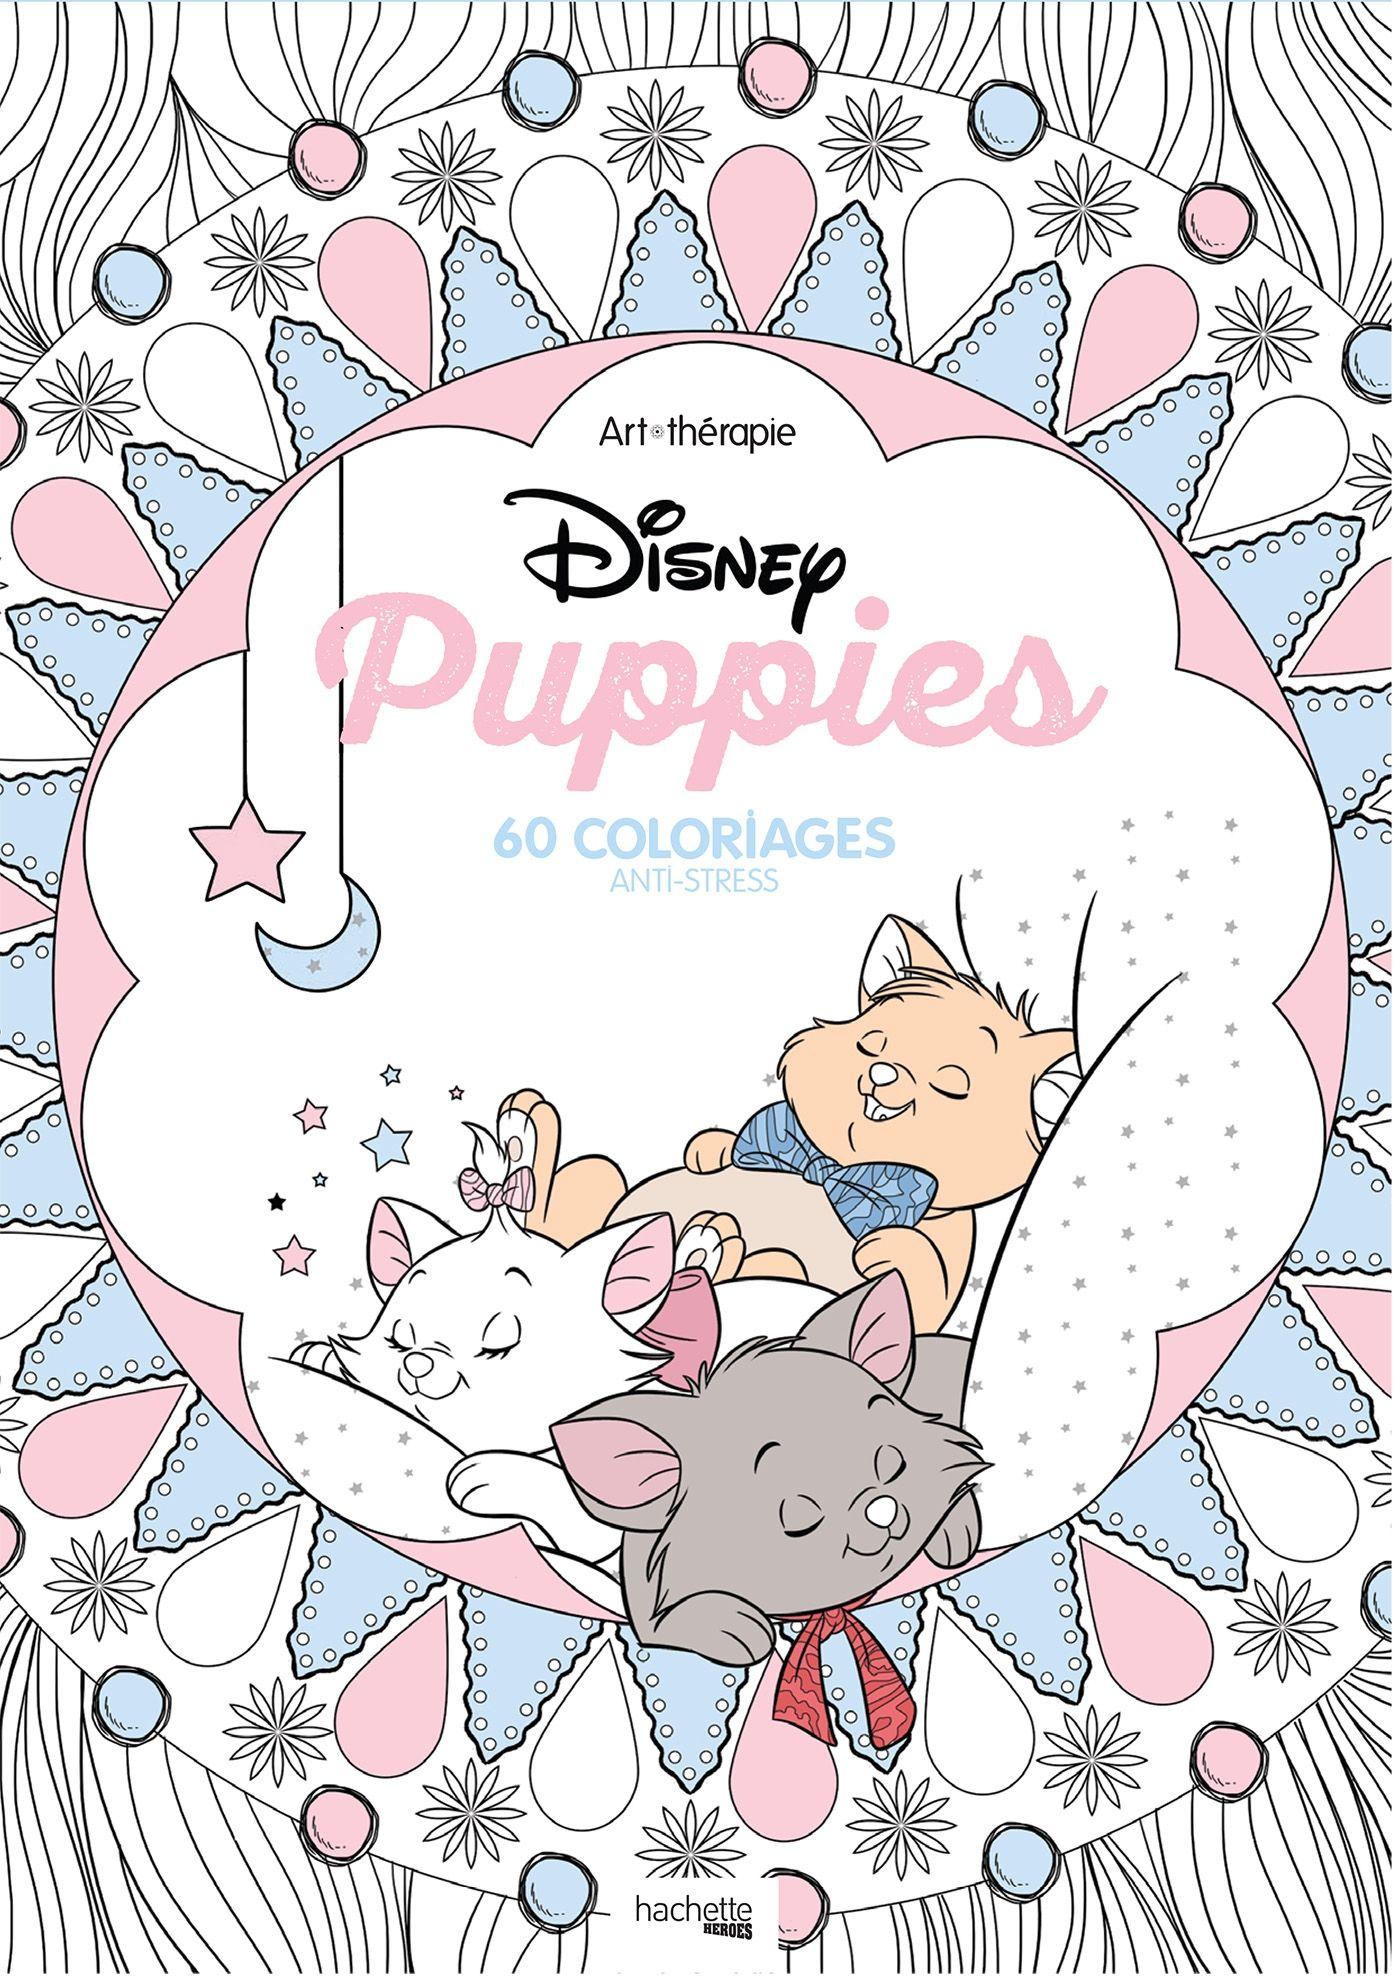 Disney « Puppies »  Coloring books, Disney colors, Coloring book